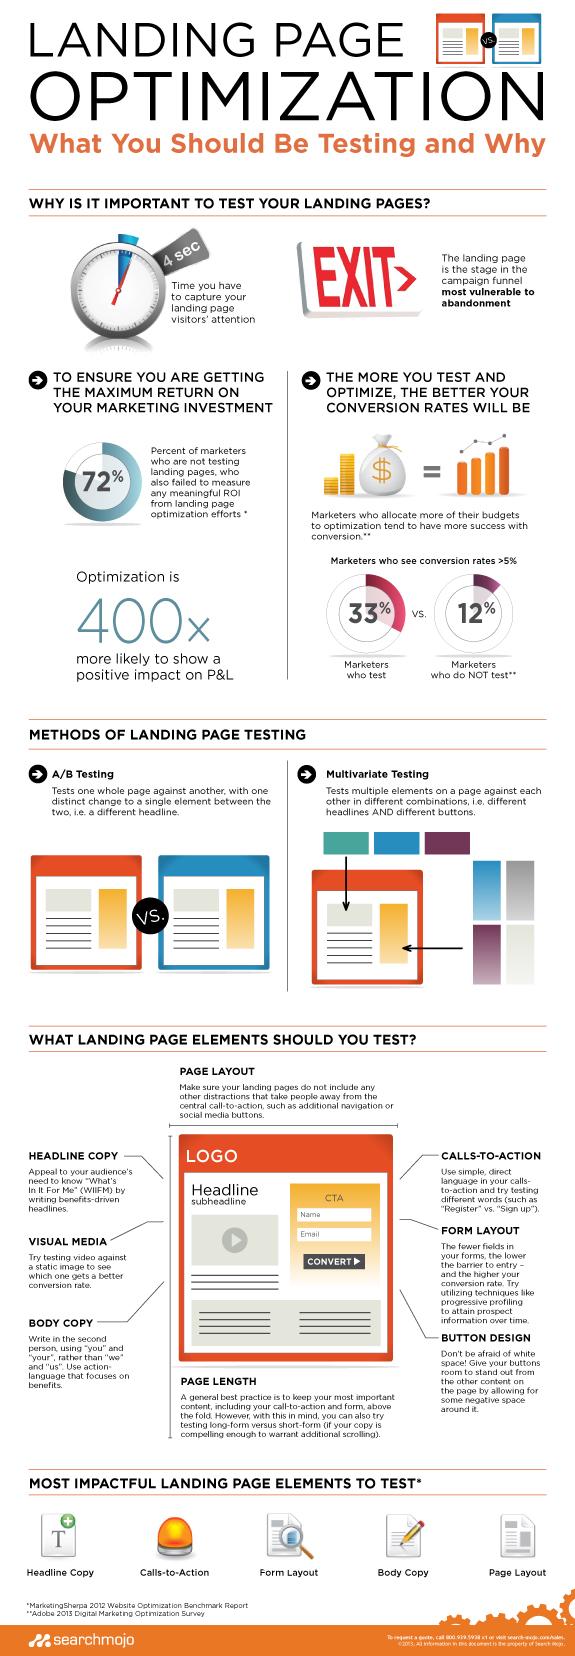 landing-page-optimization